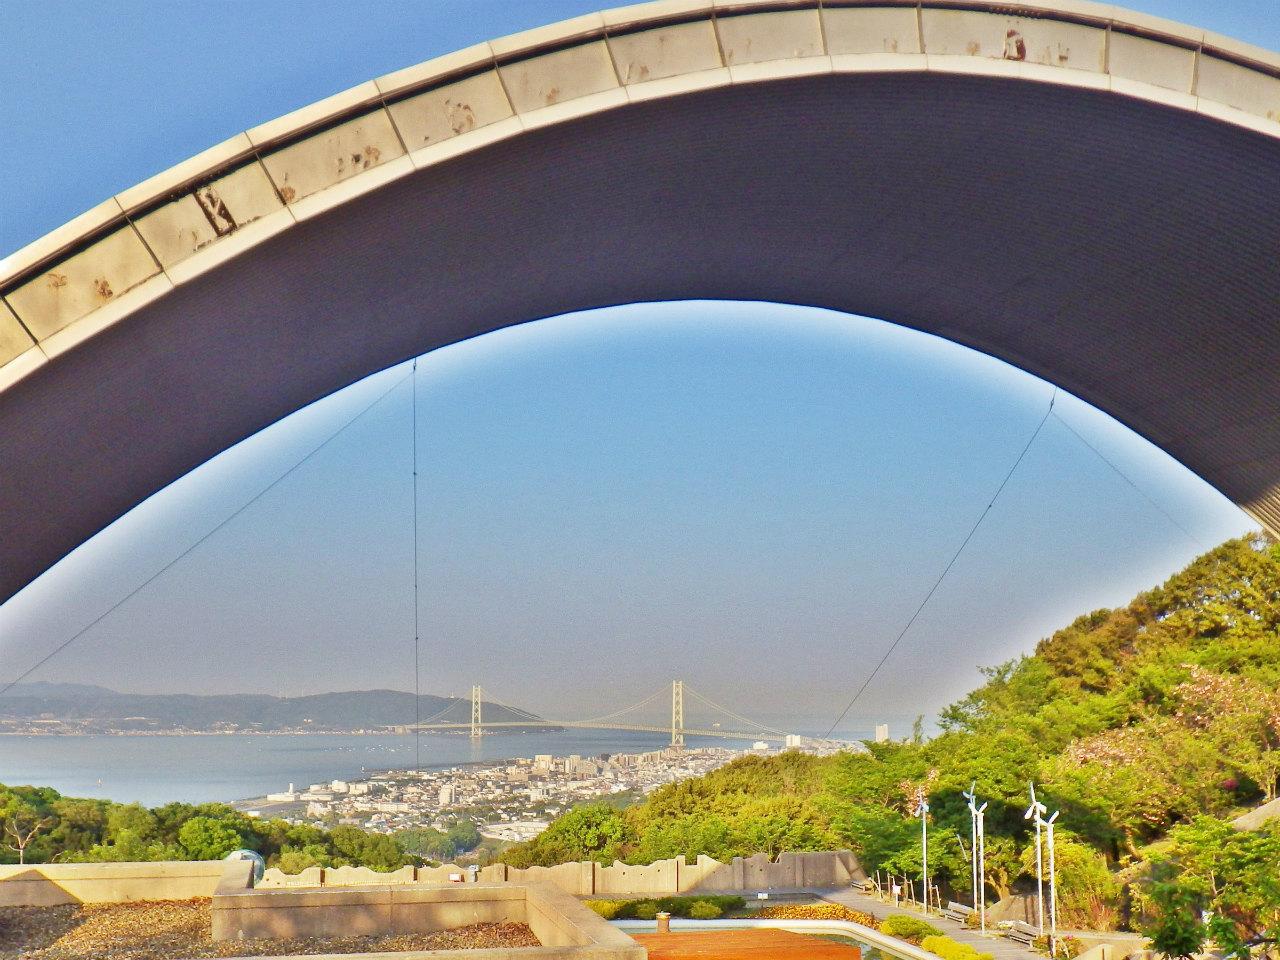 03b 明石大橋方面の眺め